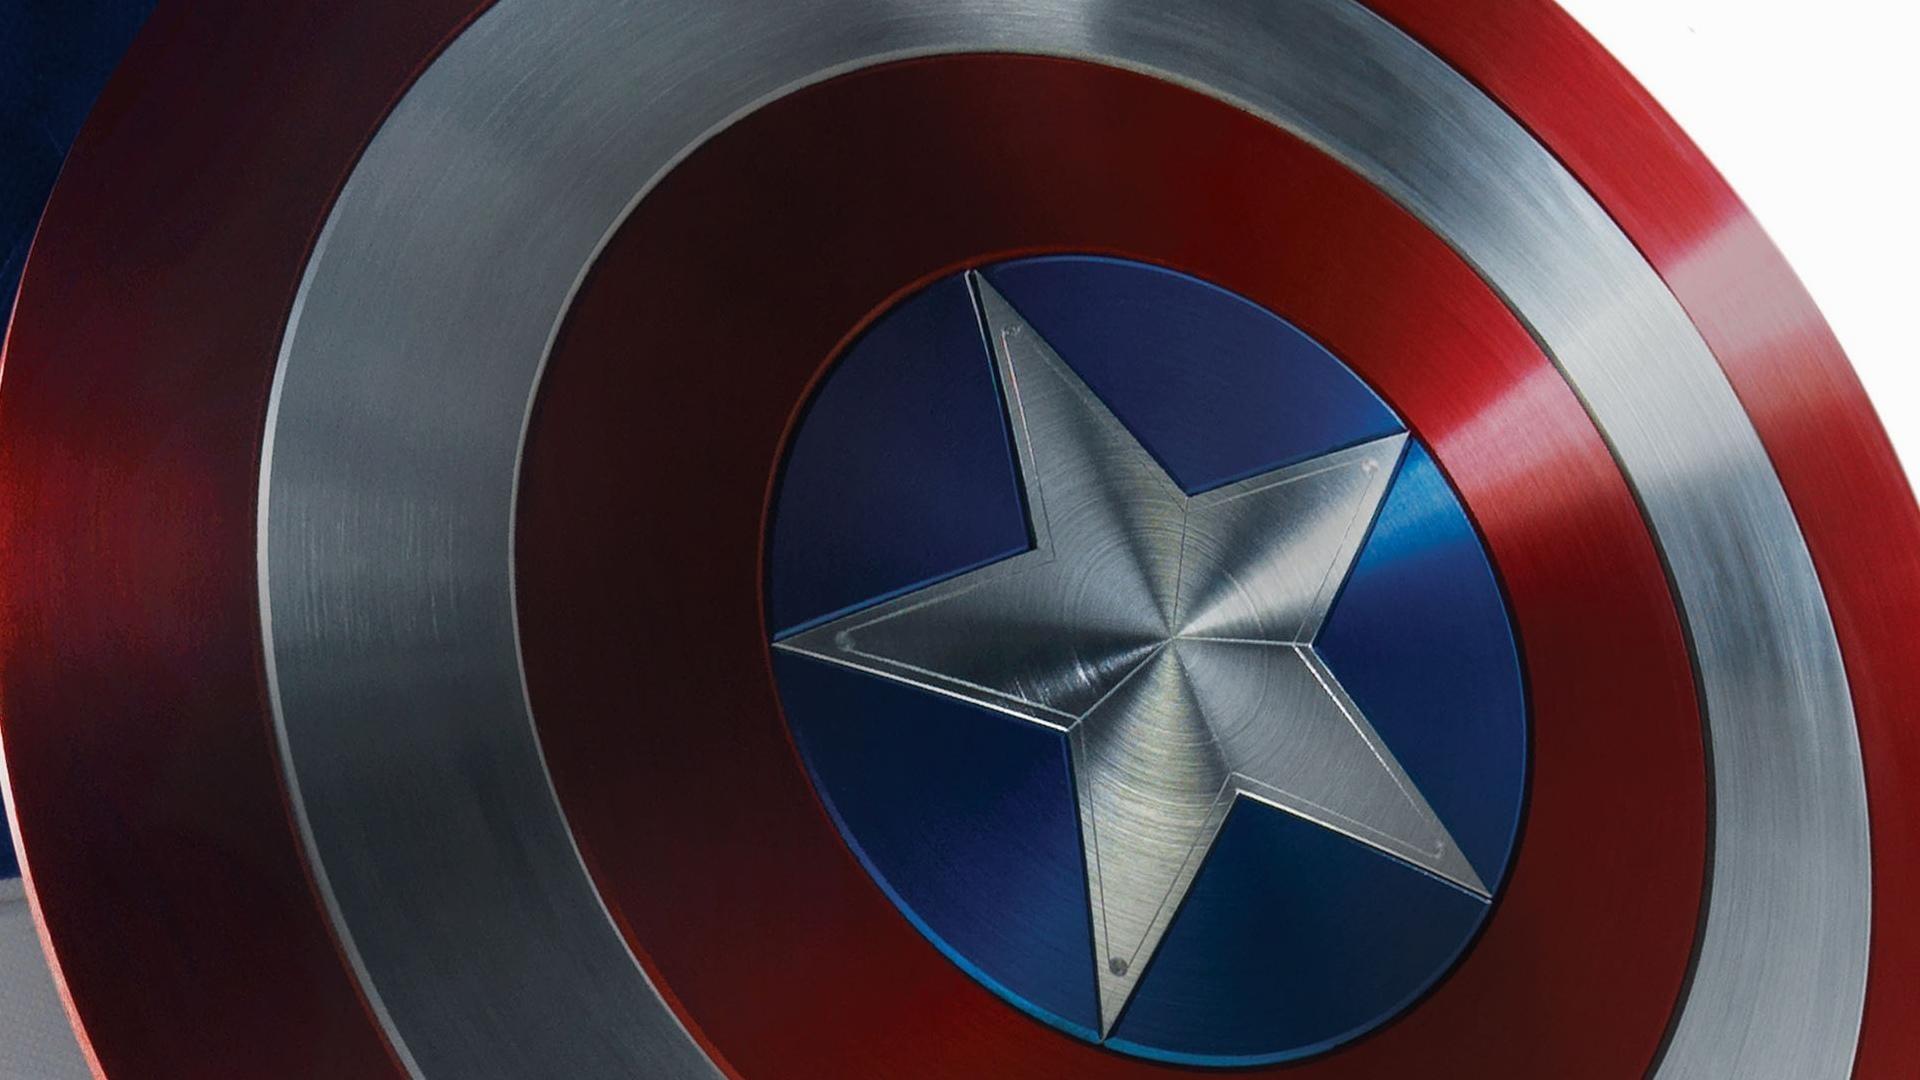 Captain-America-Shield-Photo-for-Desktop-Background-1920×1080-